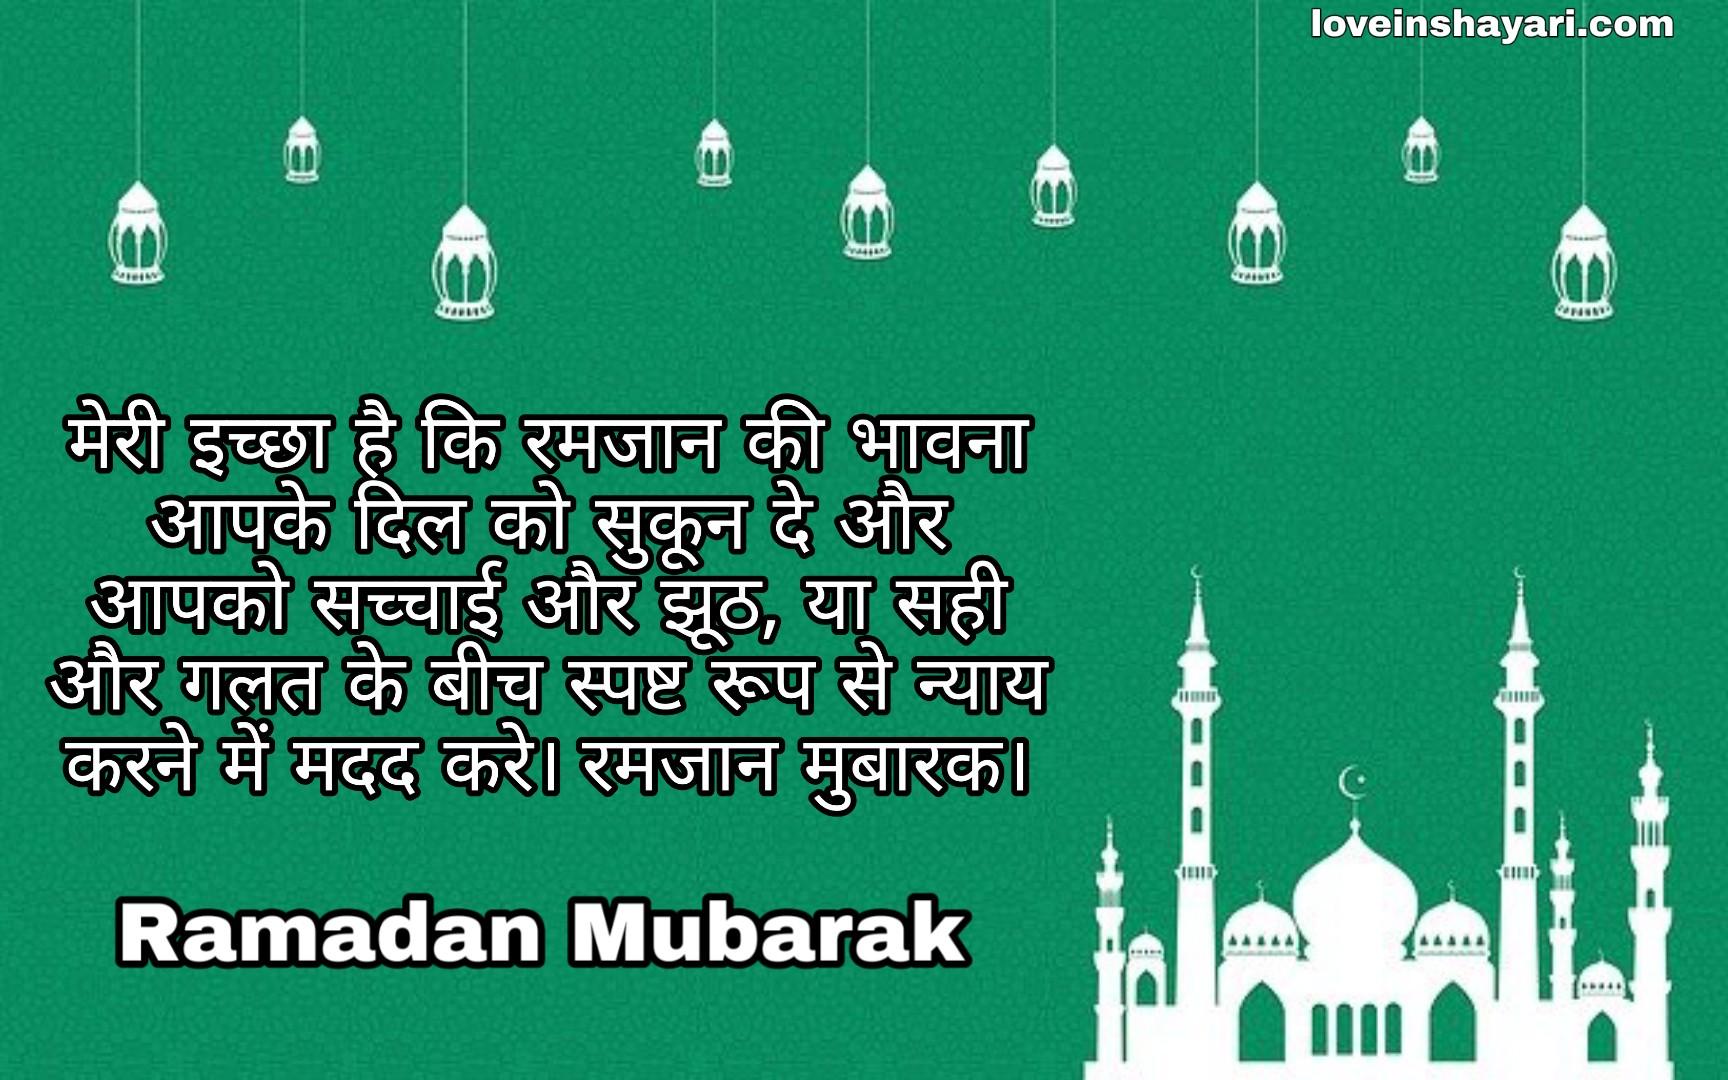 Ramadan wishes shayari quotes messages